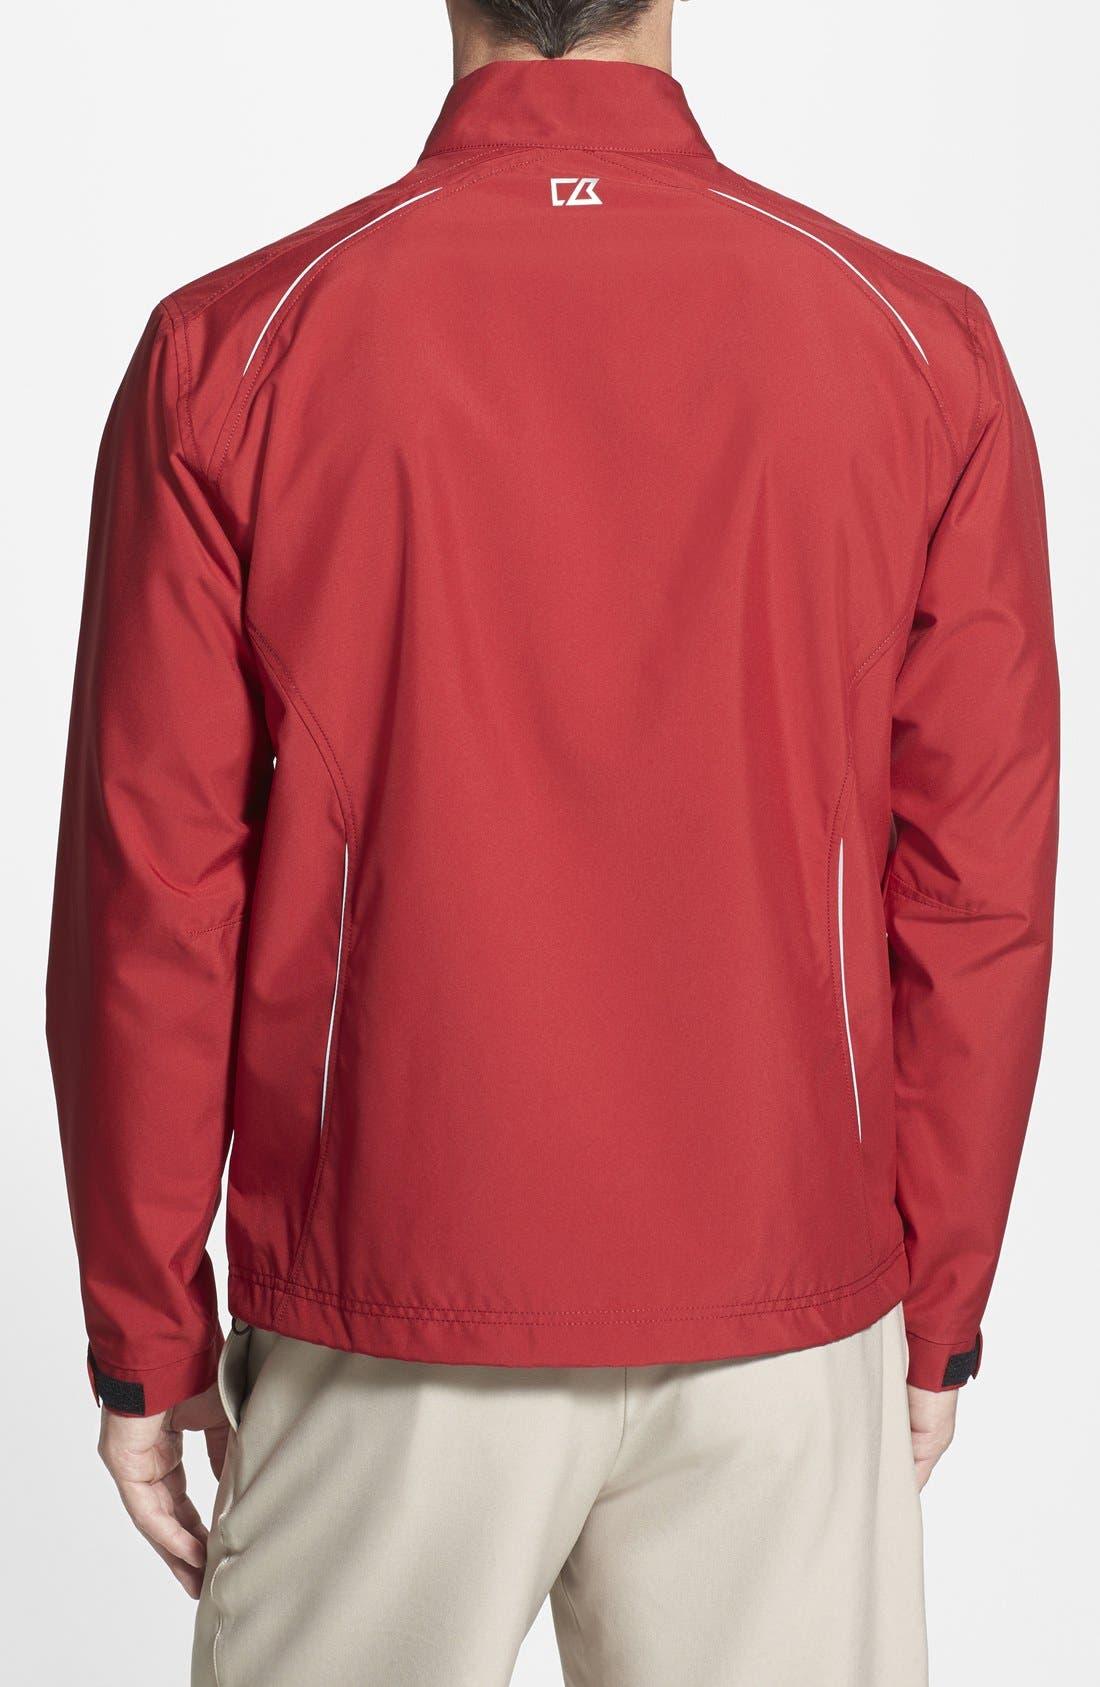 Kansas City Chiefs - Beacon WeatherTec Wind & Water Resistant Jacket,                             Alternate thumbnail 2, color,                             613